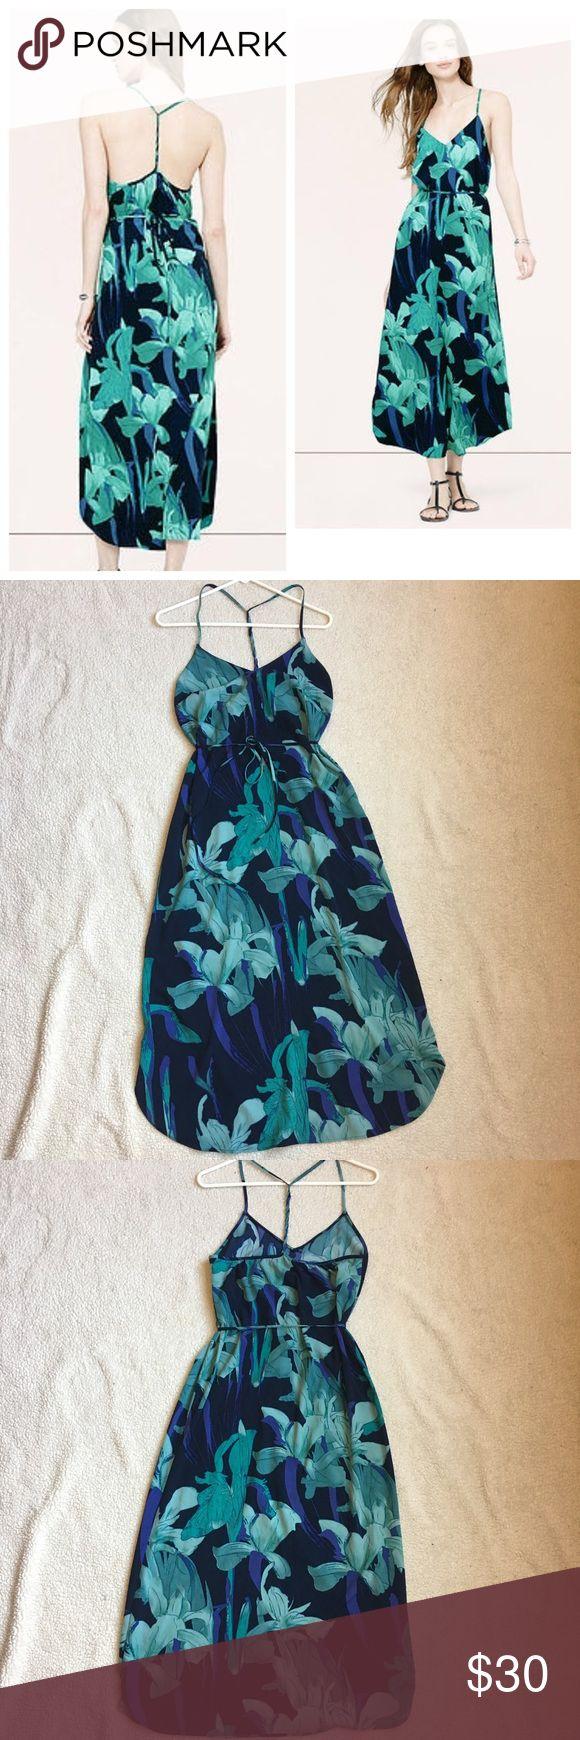 Ann Taylor Loft Floral Maxi Dress Anne Taylor Loft Floral Maxi Dress. Size Small. Spaghetti strap with a braided detail T Strap. Ann Taylor Dresses Maxi